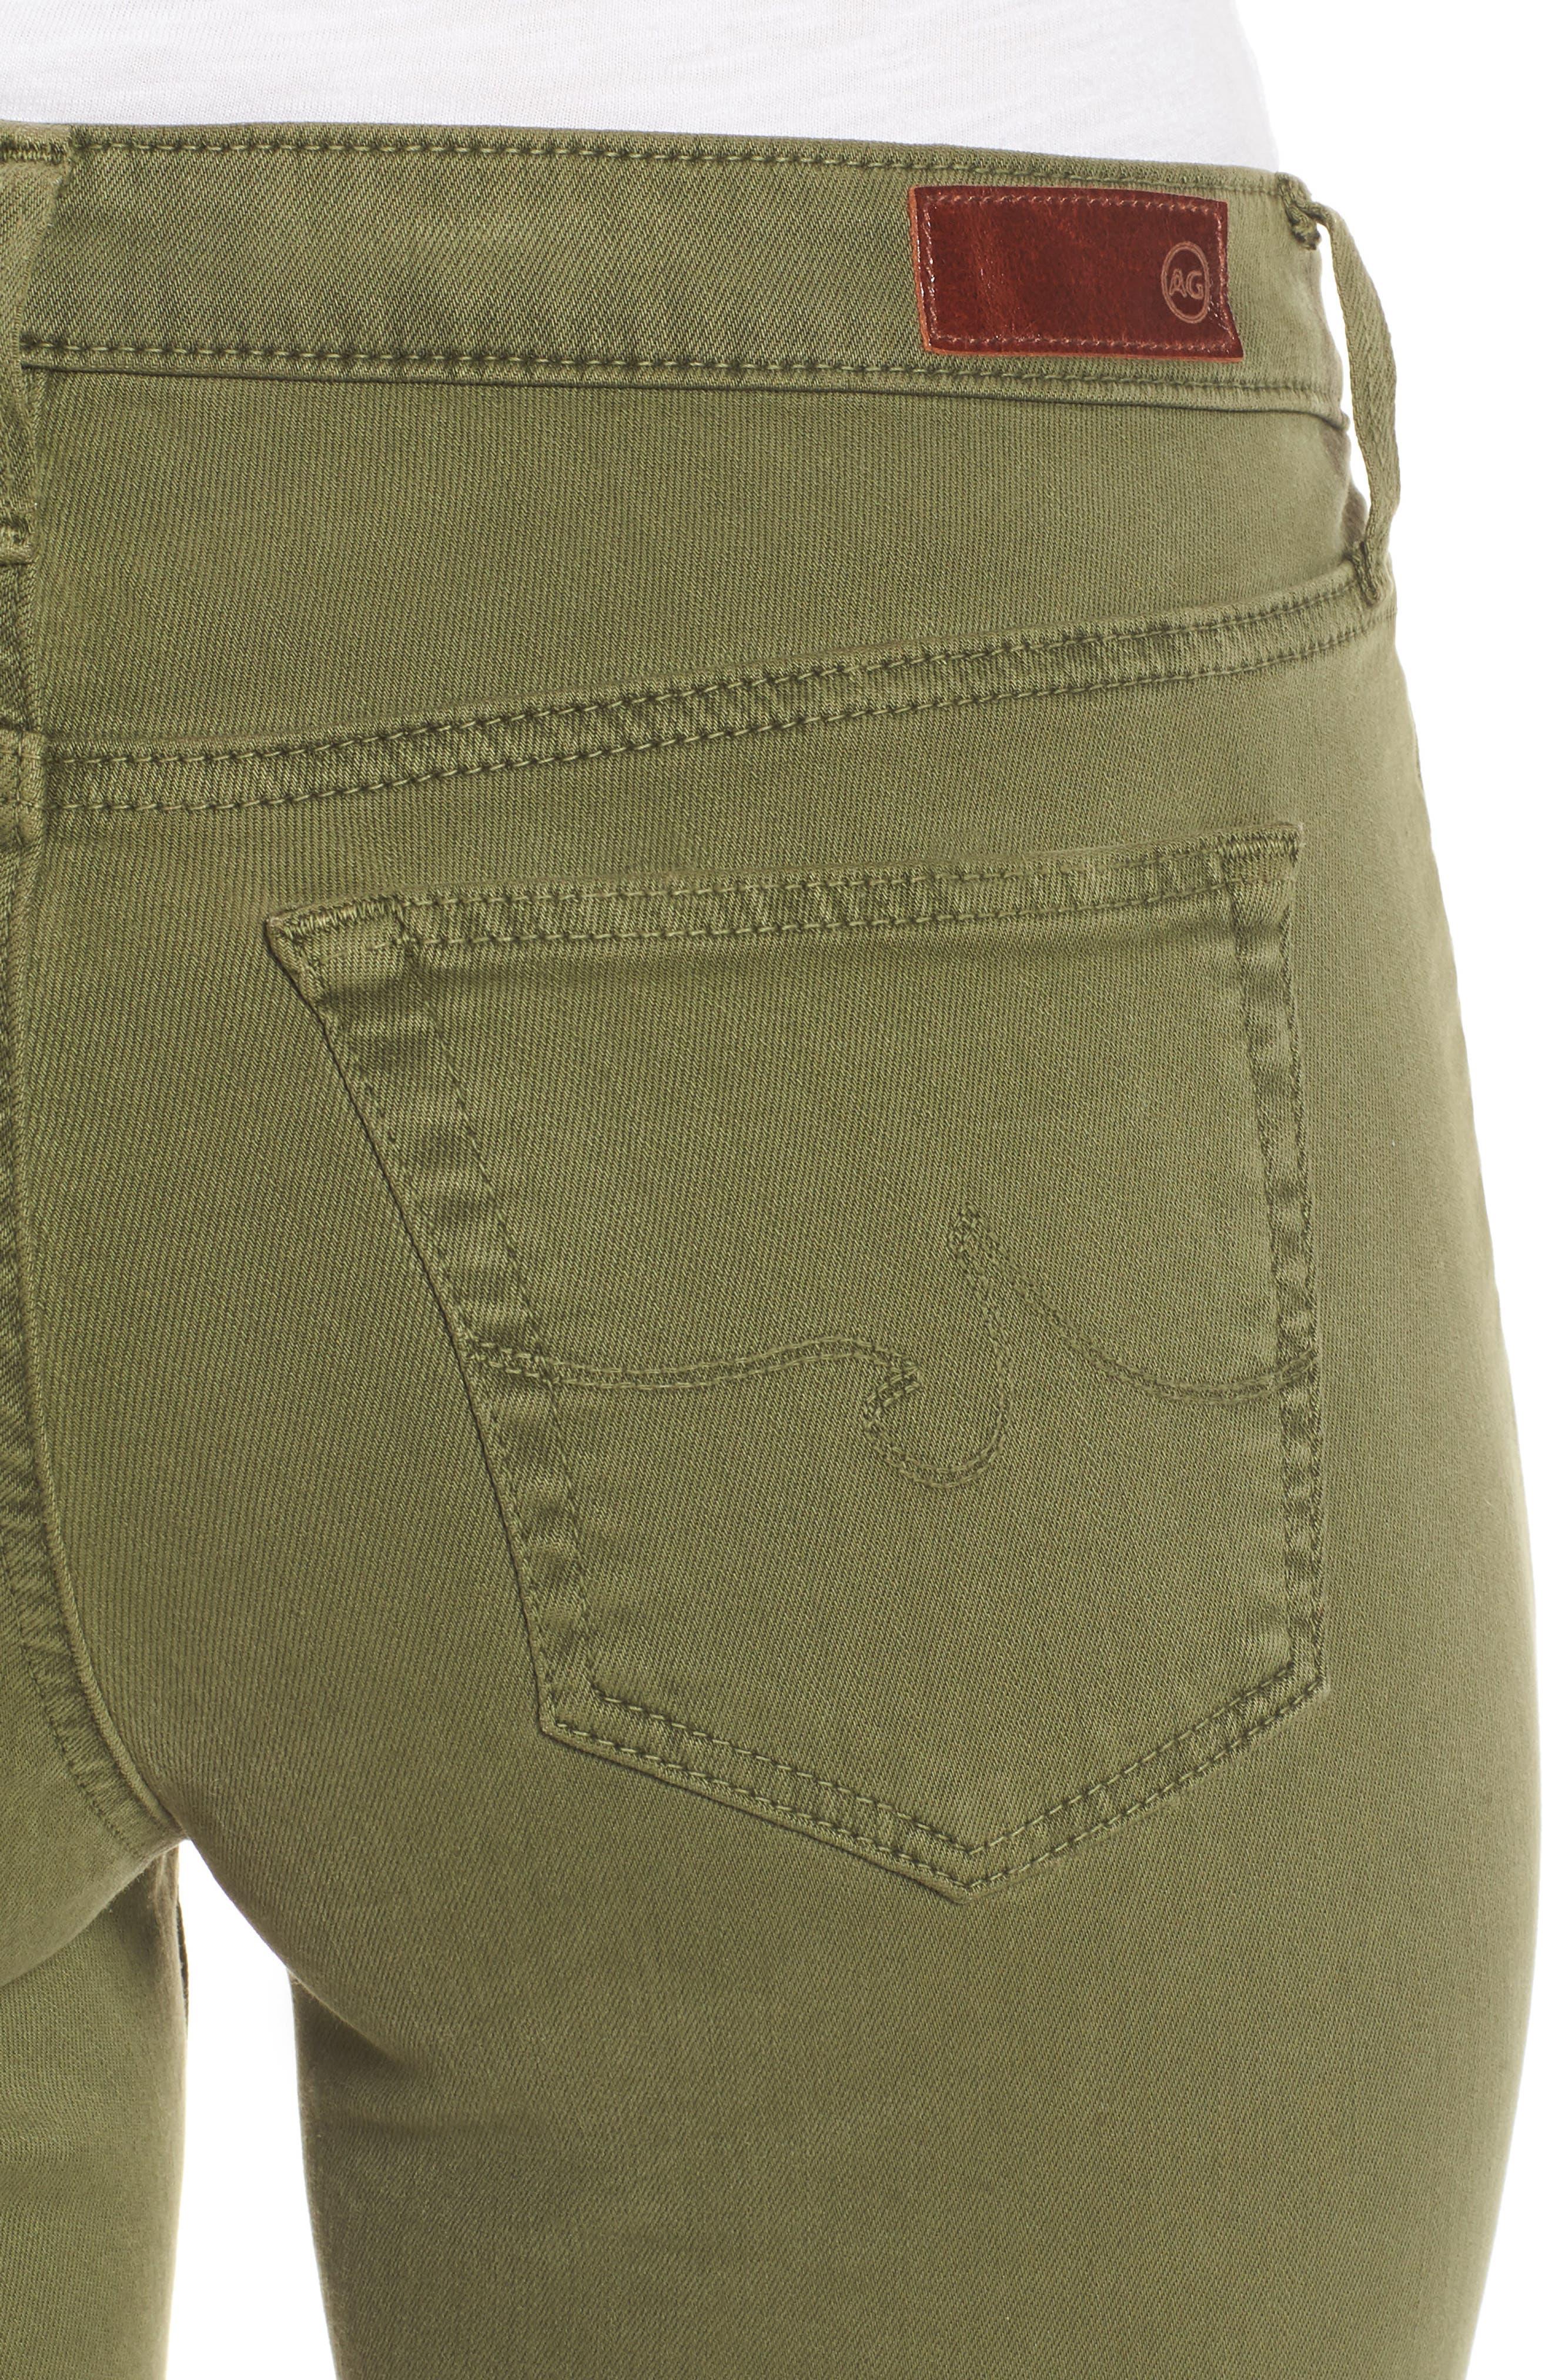 'The Legging' Ankle Jeans,                             Alternate thumbnail 4, color,                             SULFUR OLIVE GROVE